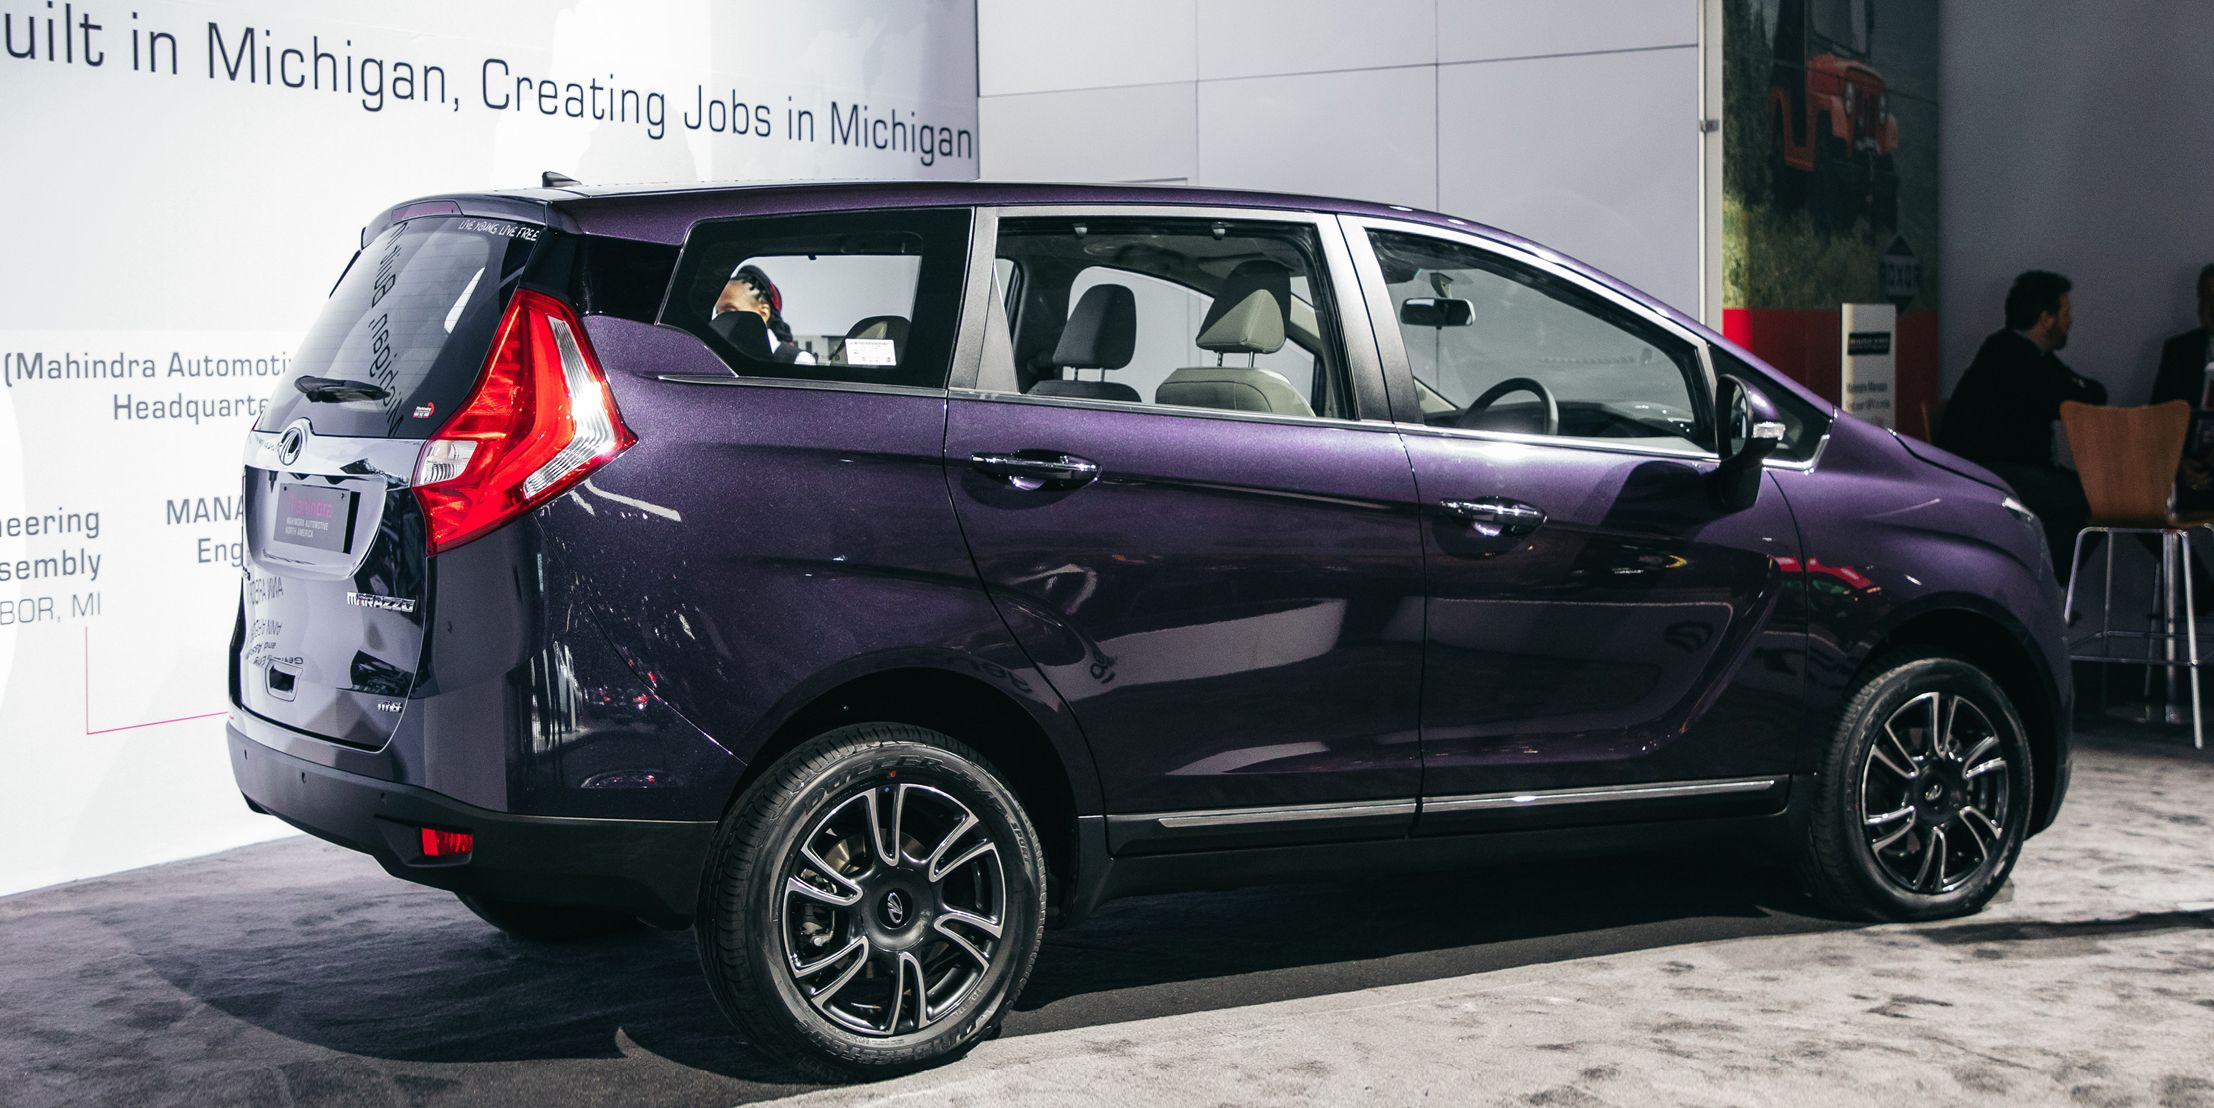 The Mahindra Marazzo, Made in Michigan, Will Revolutionize Safety on India's Roads